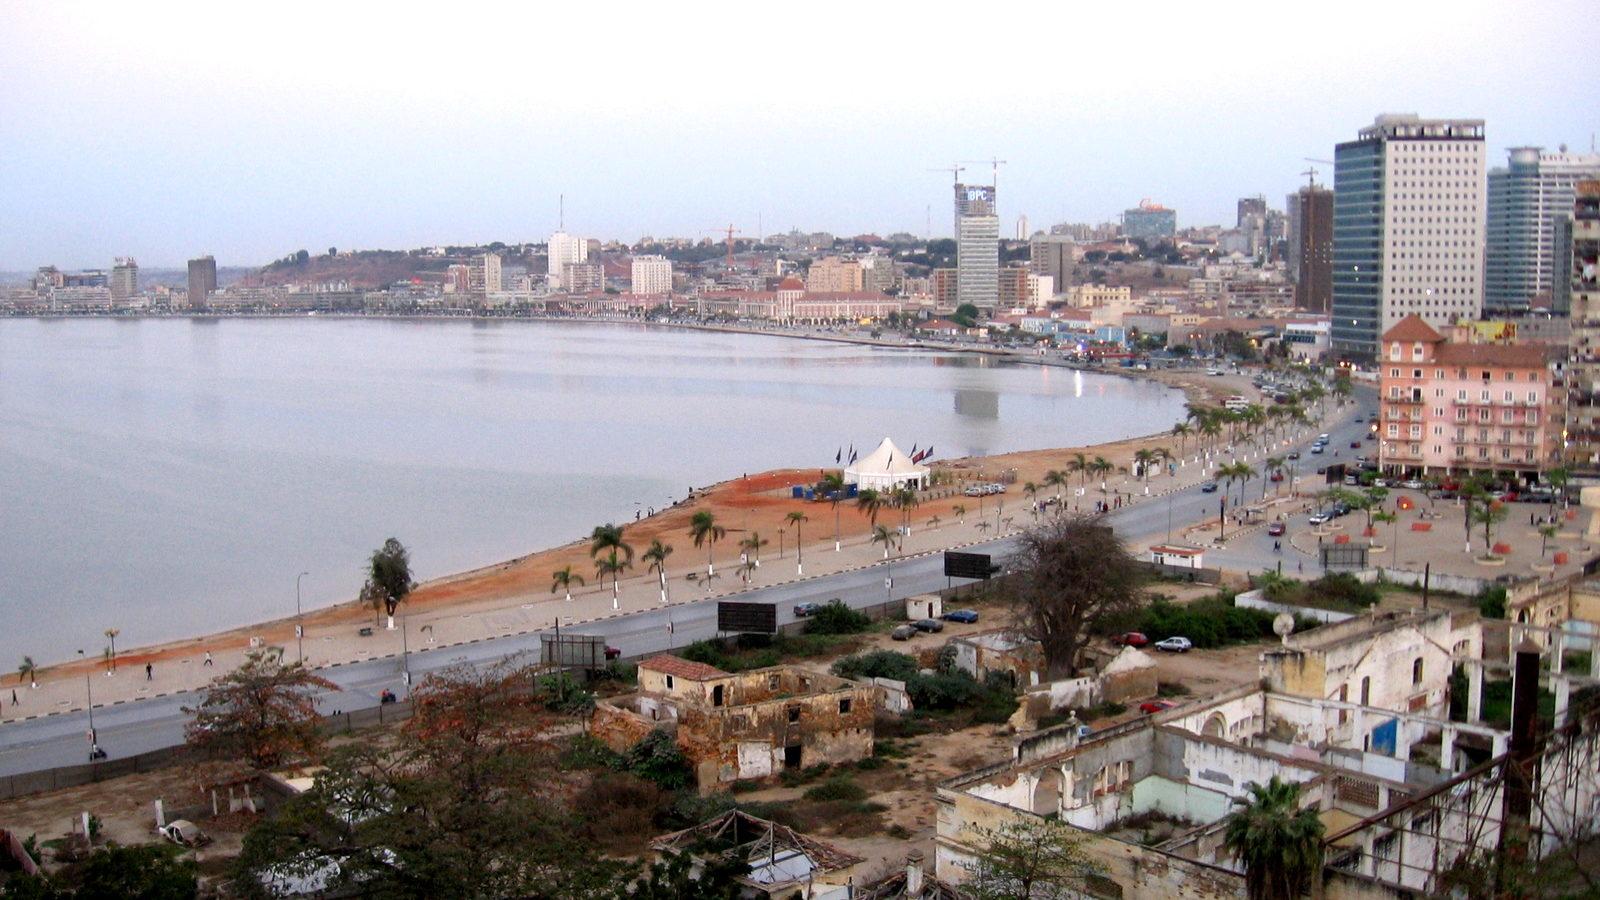 Consumidores de Luanda enfrentam preços proibitivos